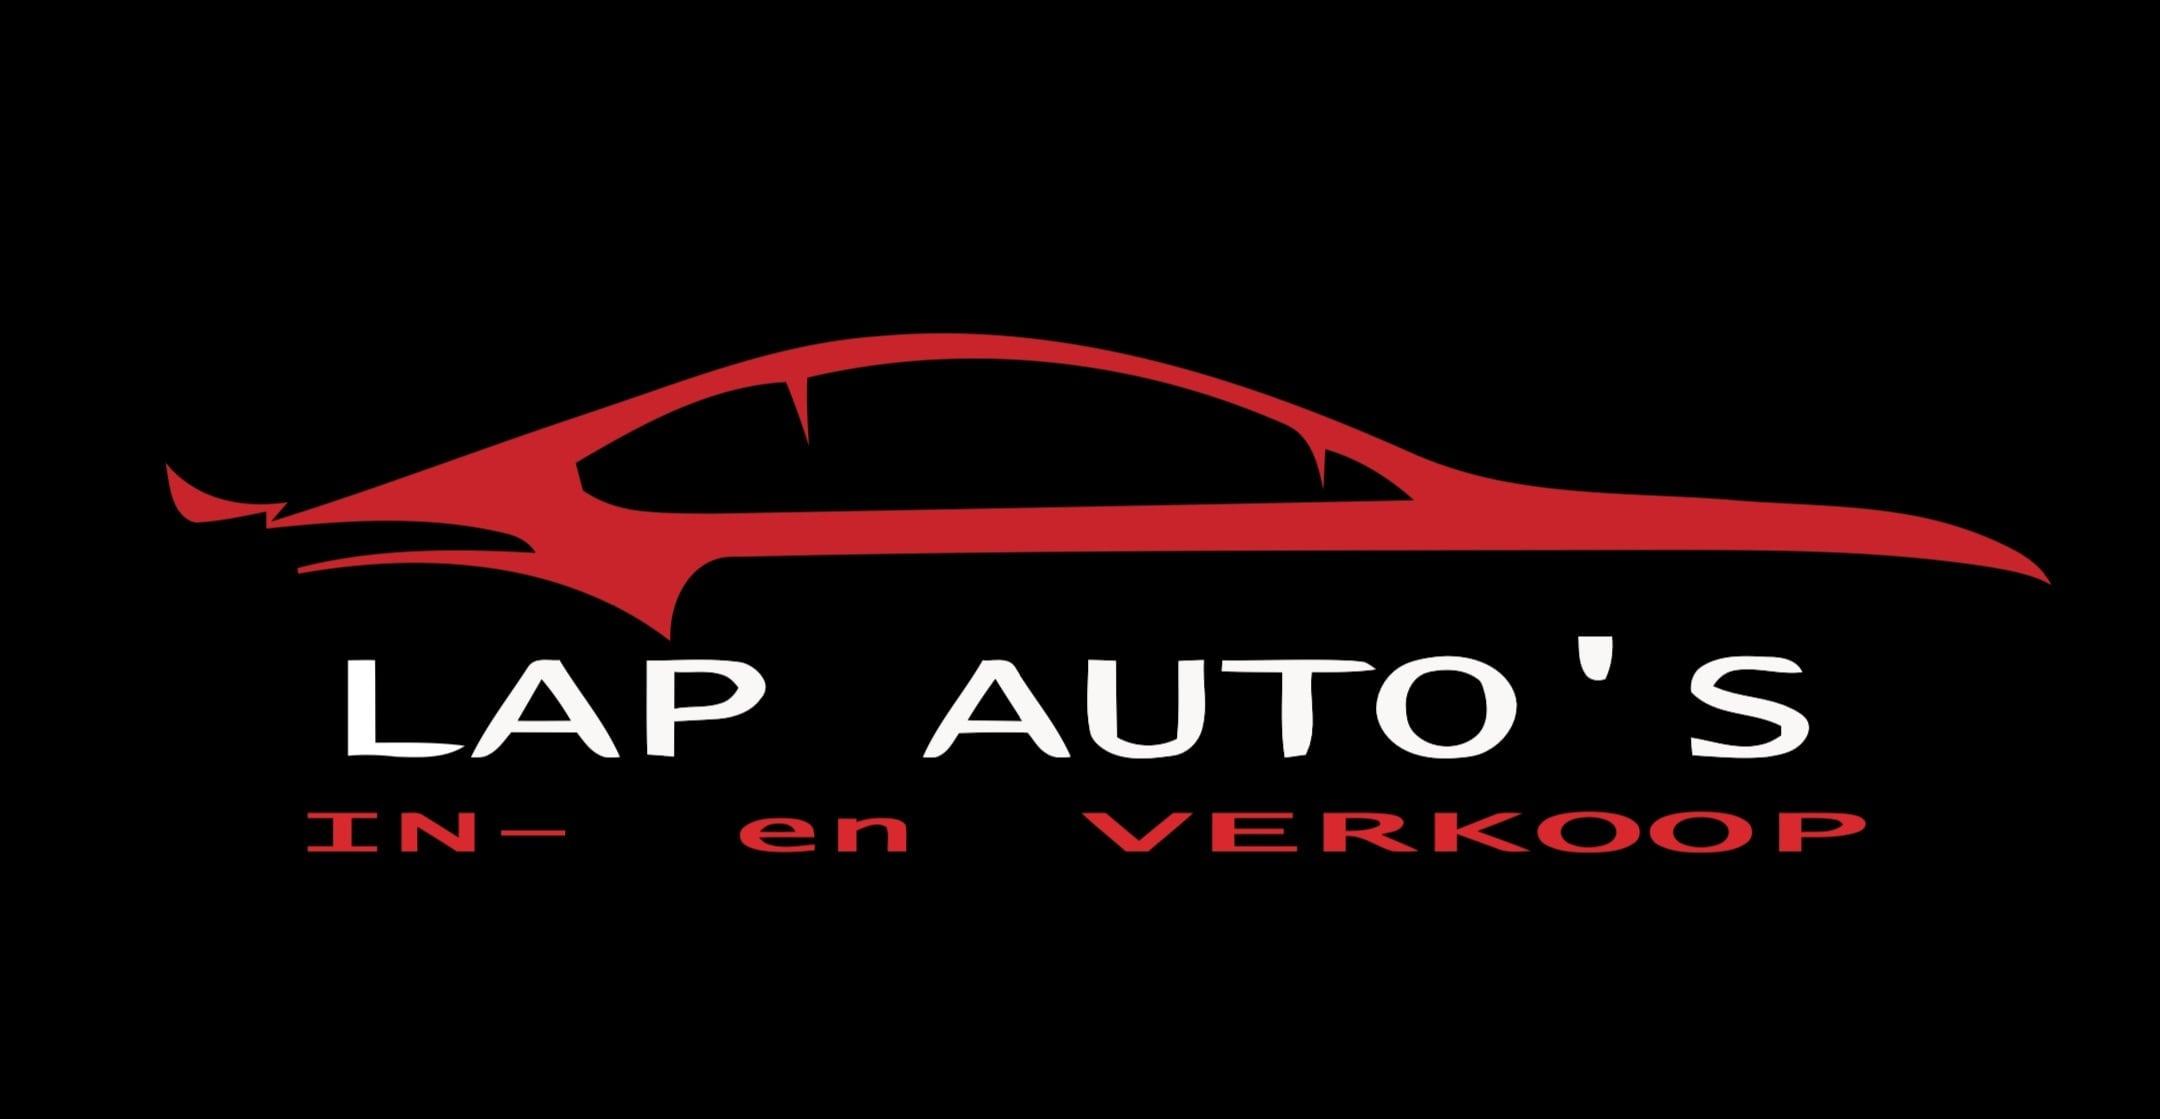 Lap Auto's